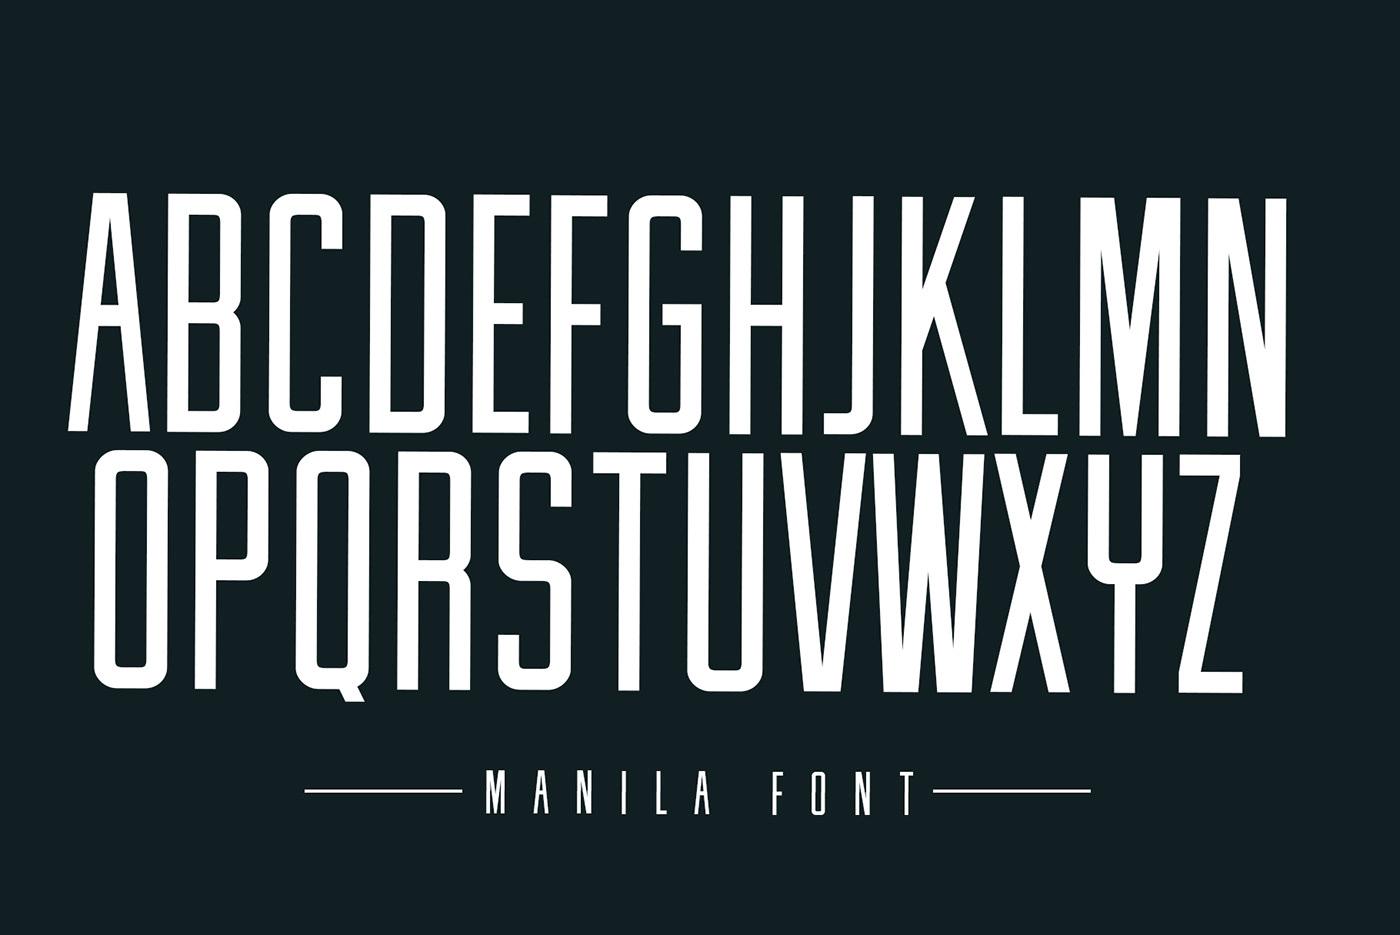 download font free freebie Typeface